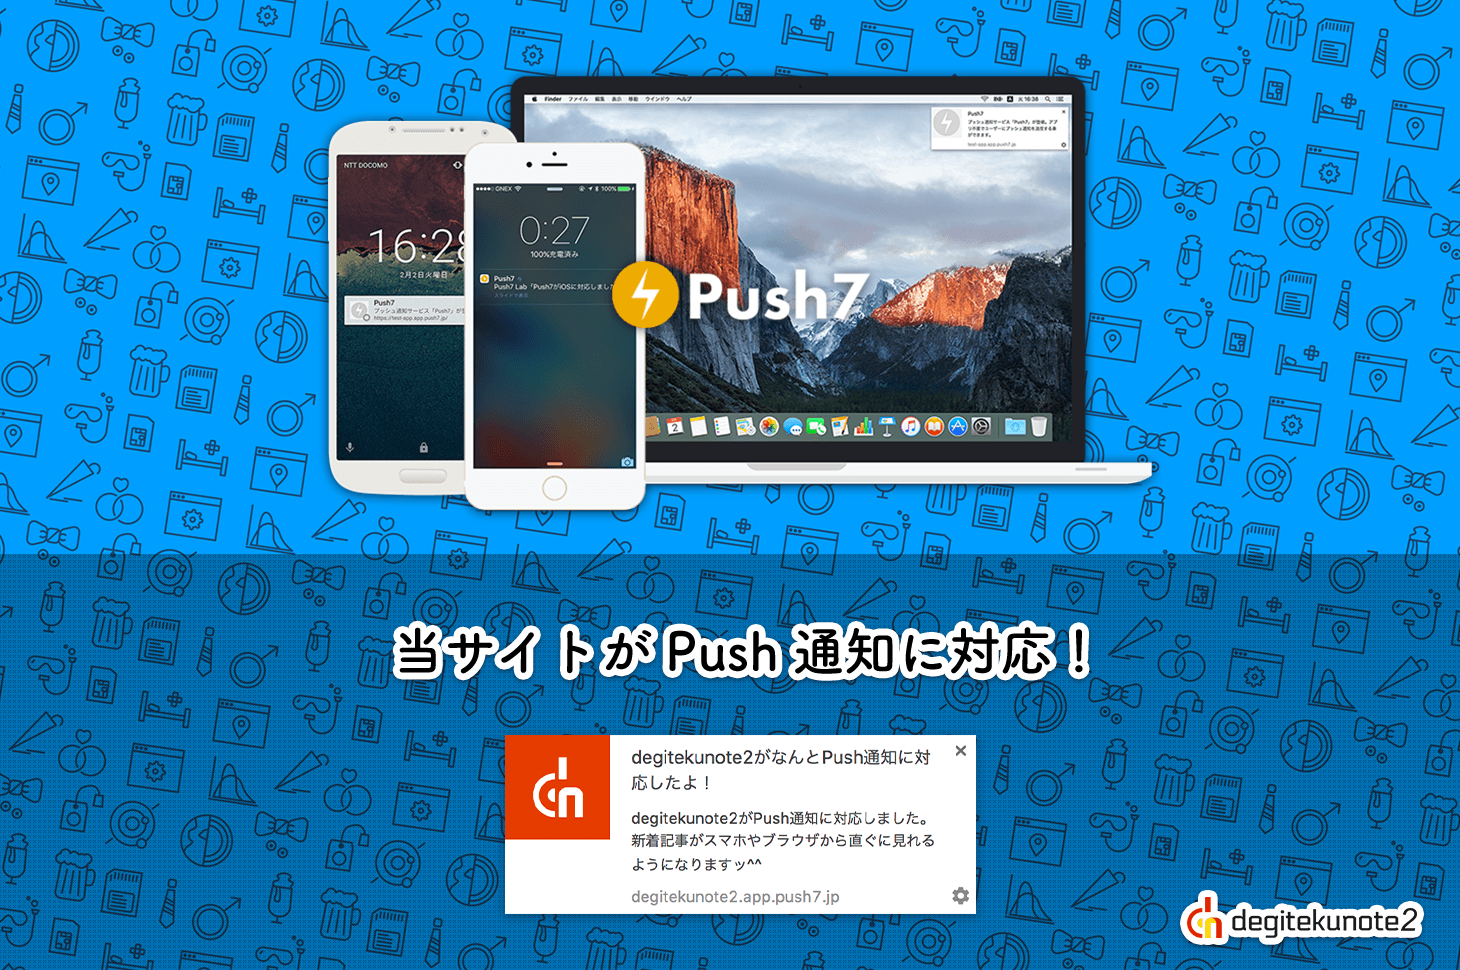 001_2016.04.02_push7